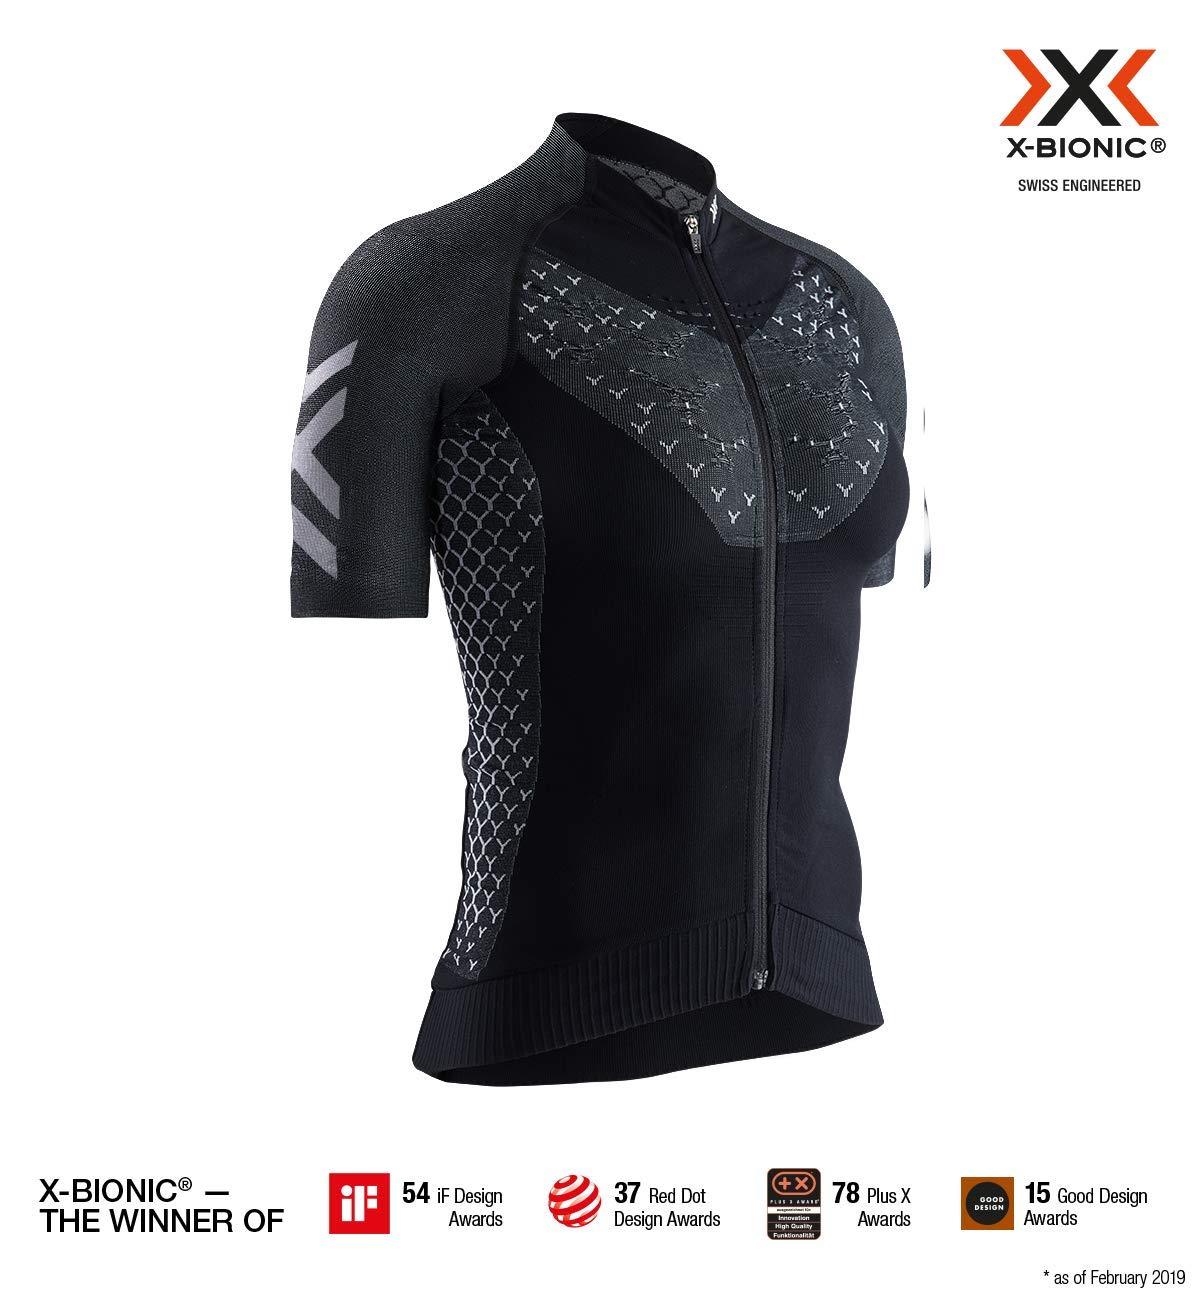 X-Bionic Invent 4.0 Lt T-Shirt Arctic White/Dolomite Grey L